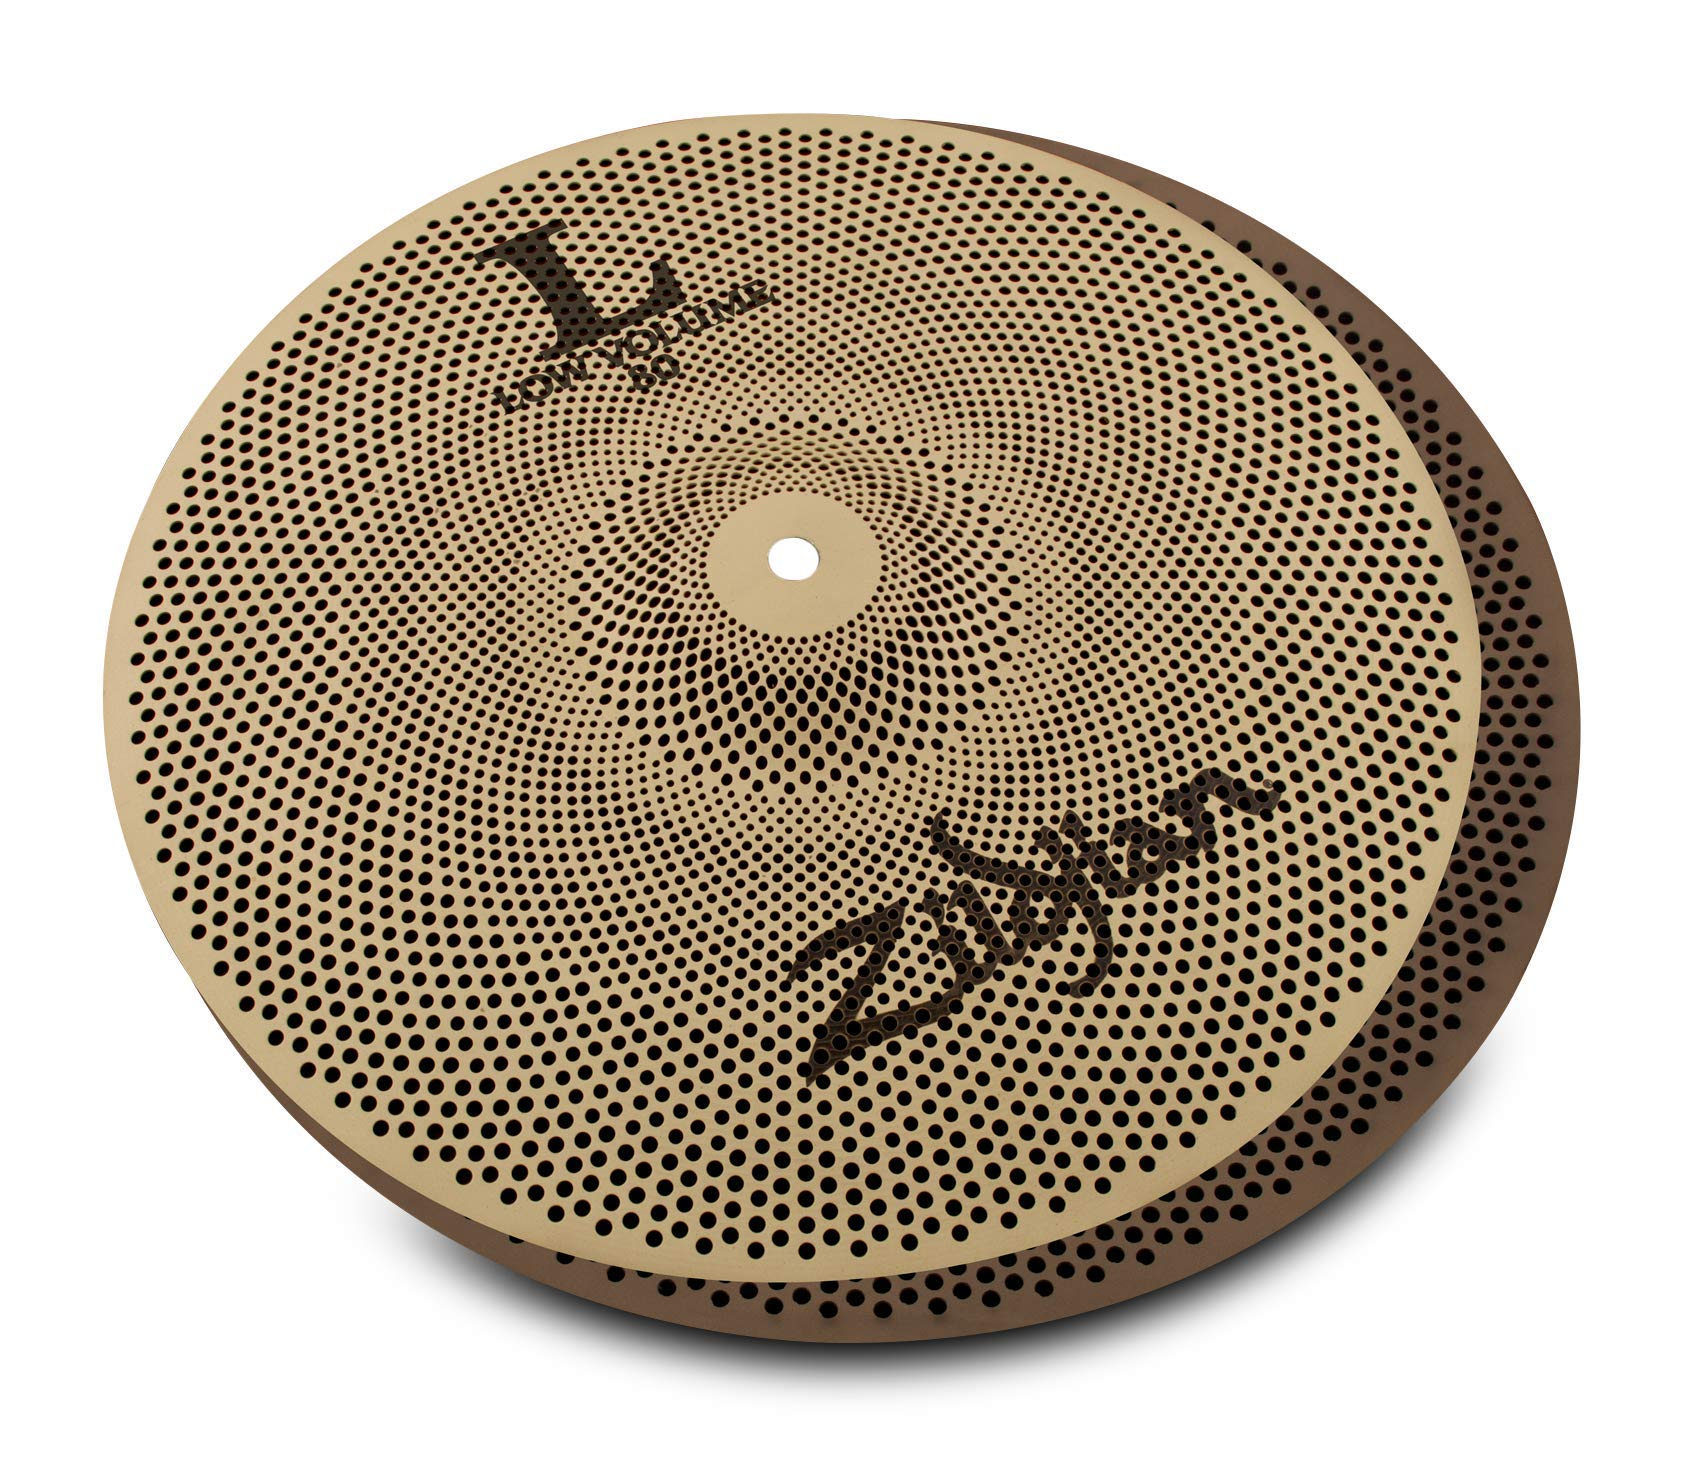 Zildjian L80 Low Volume 14/16/18 Cymbal Set by Avedis Zildjian Company (Image #2)